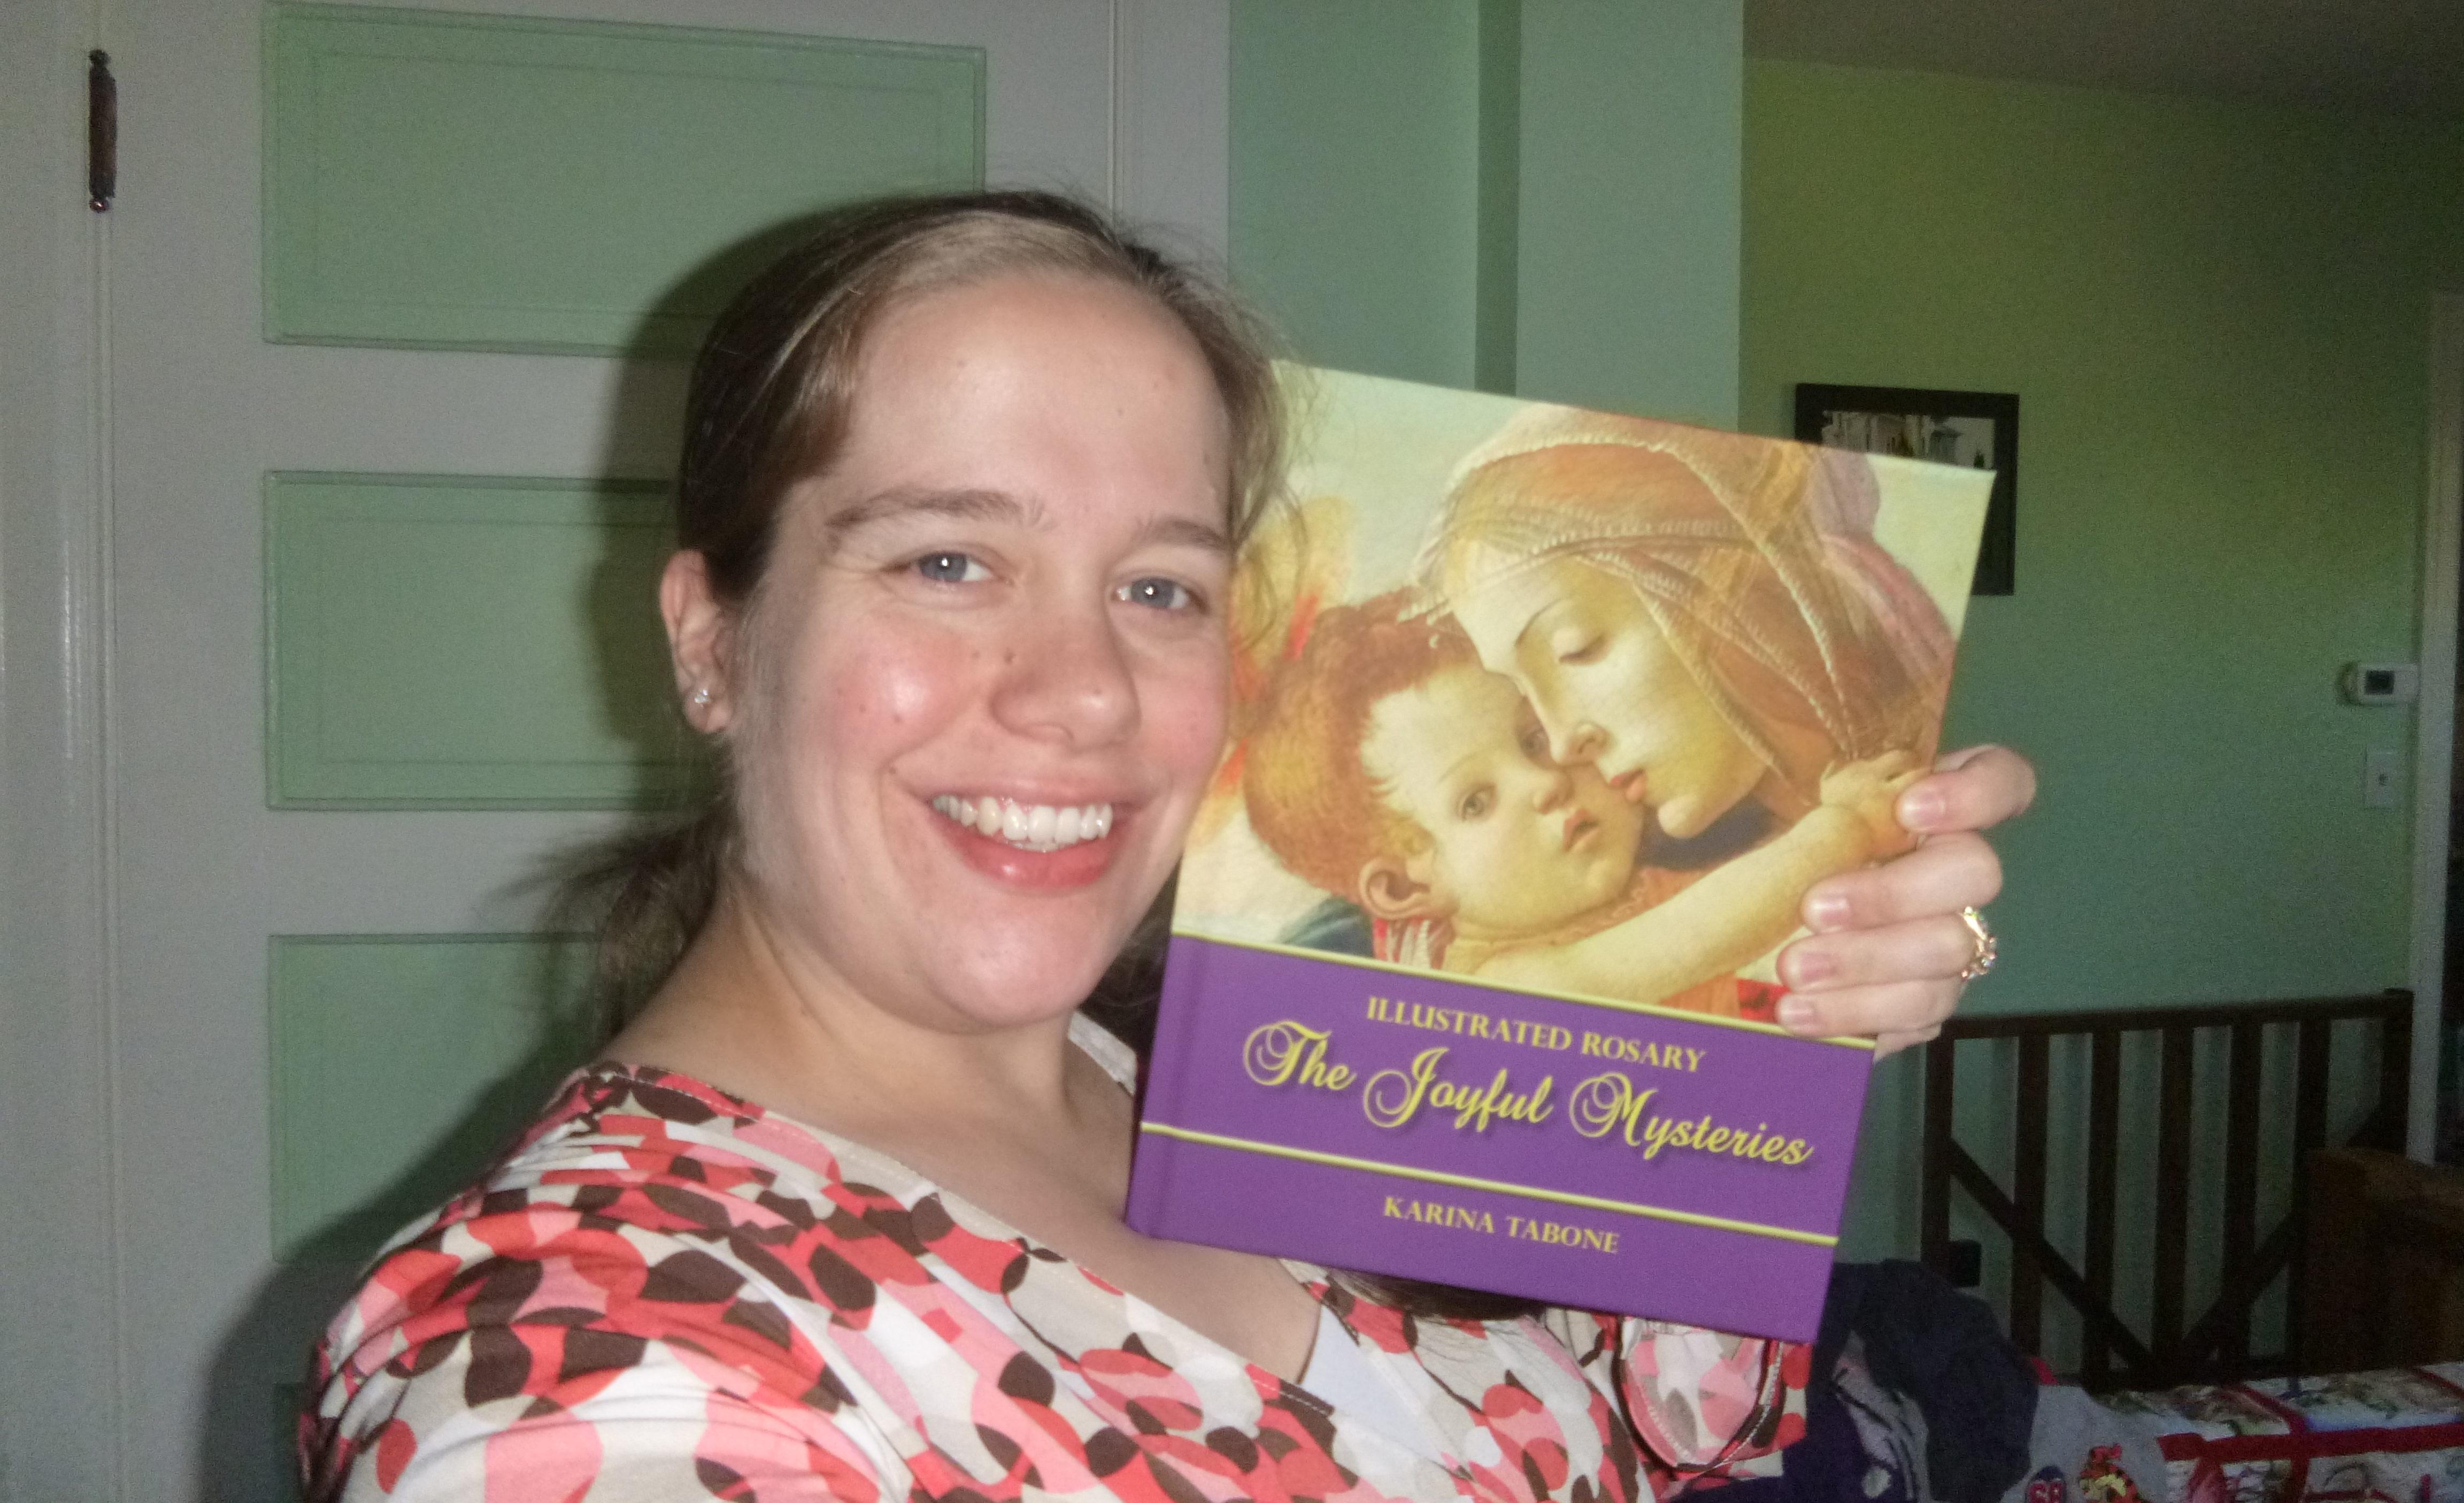 Karina Tabone holding up her first book, The Joyful Mysteries. Via IllustratedPrayer.com